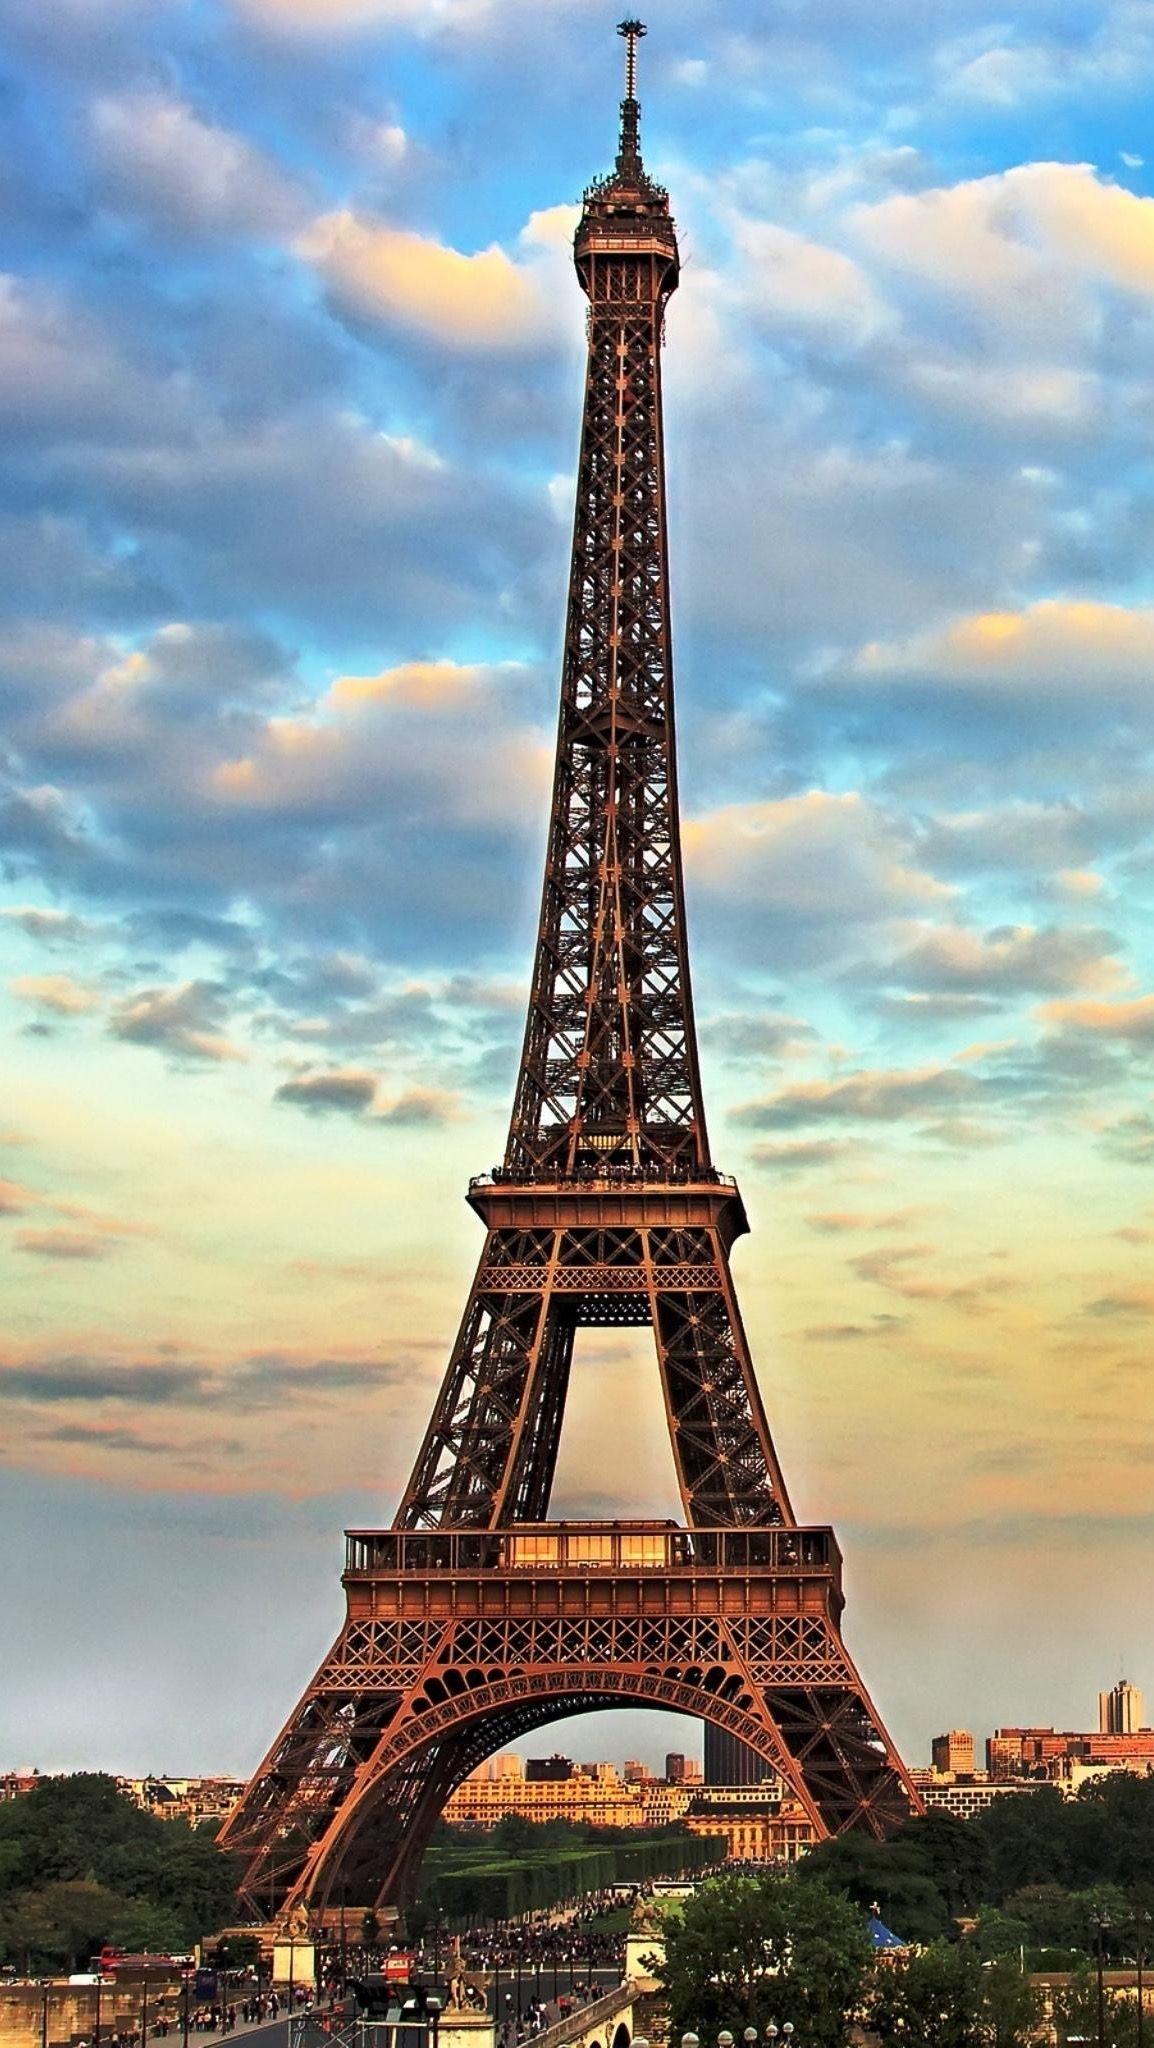 Обои Эйфелева башня, рисунок. Города foto 7